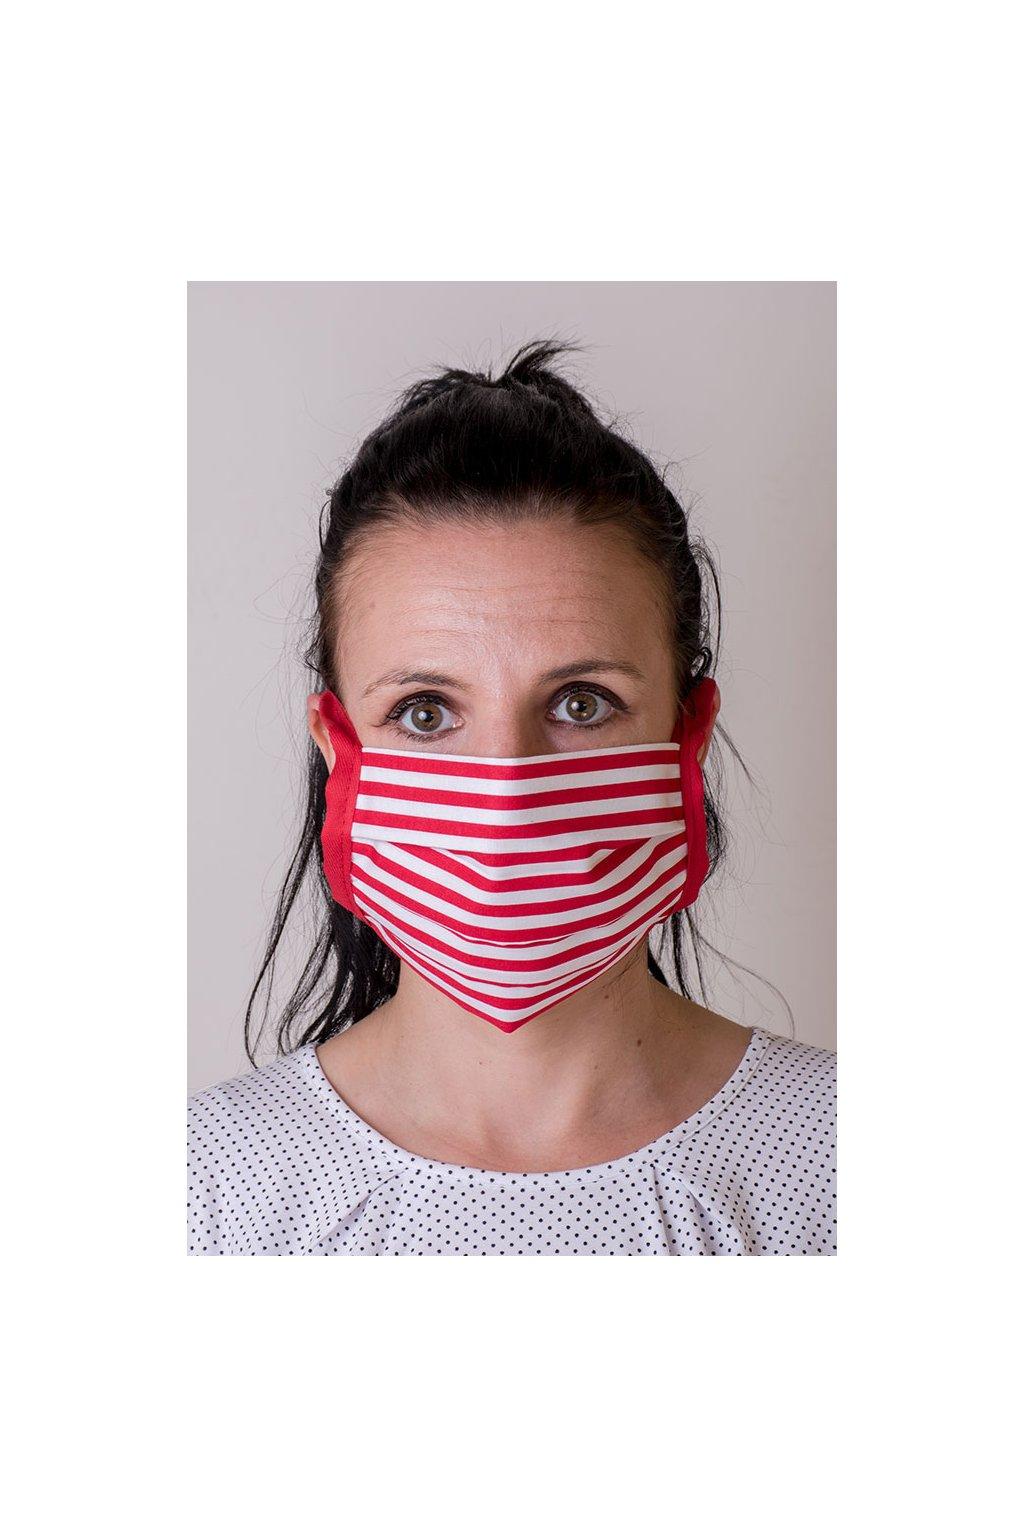 Bavlněná rouška na ústa a nos dvouvrstvá skládaná s kapsou, se šňůrami z keprové stuhy, 797-216, Bílá/červená